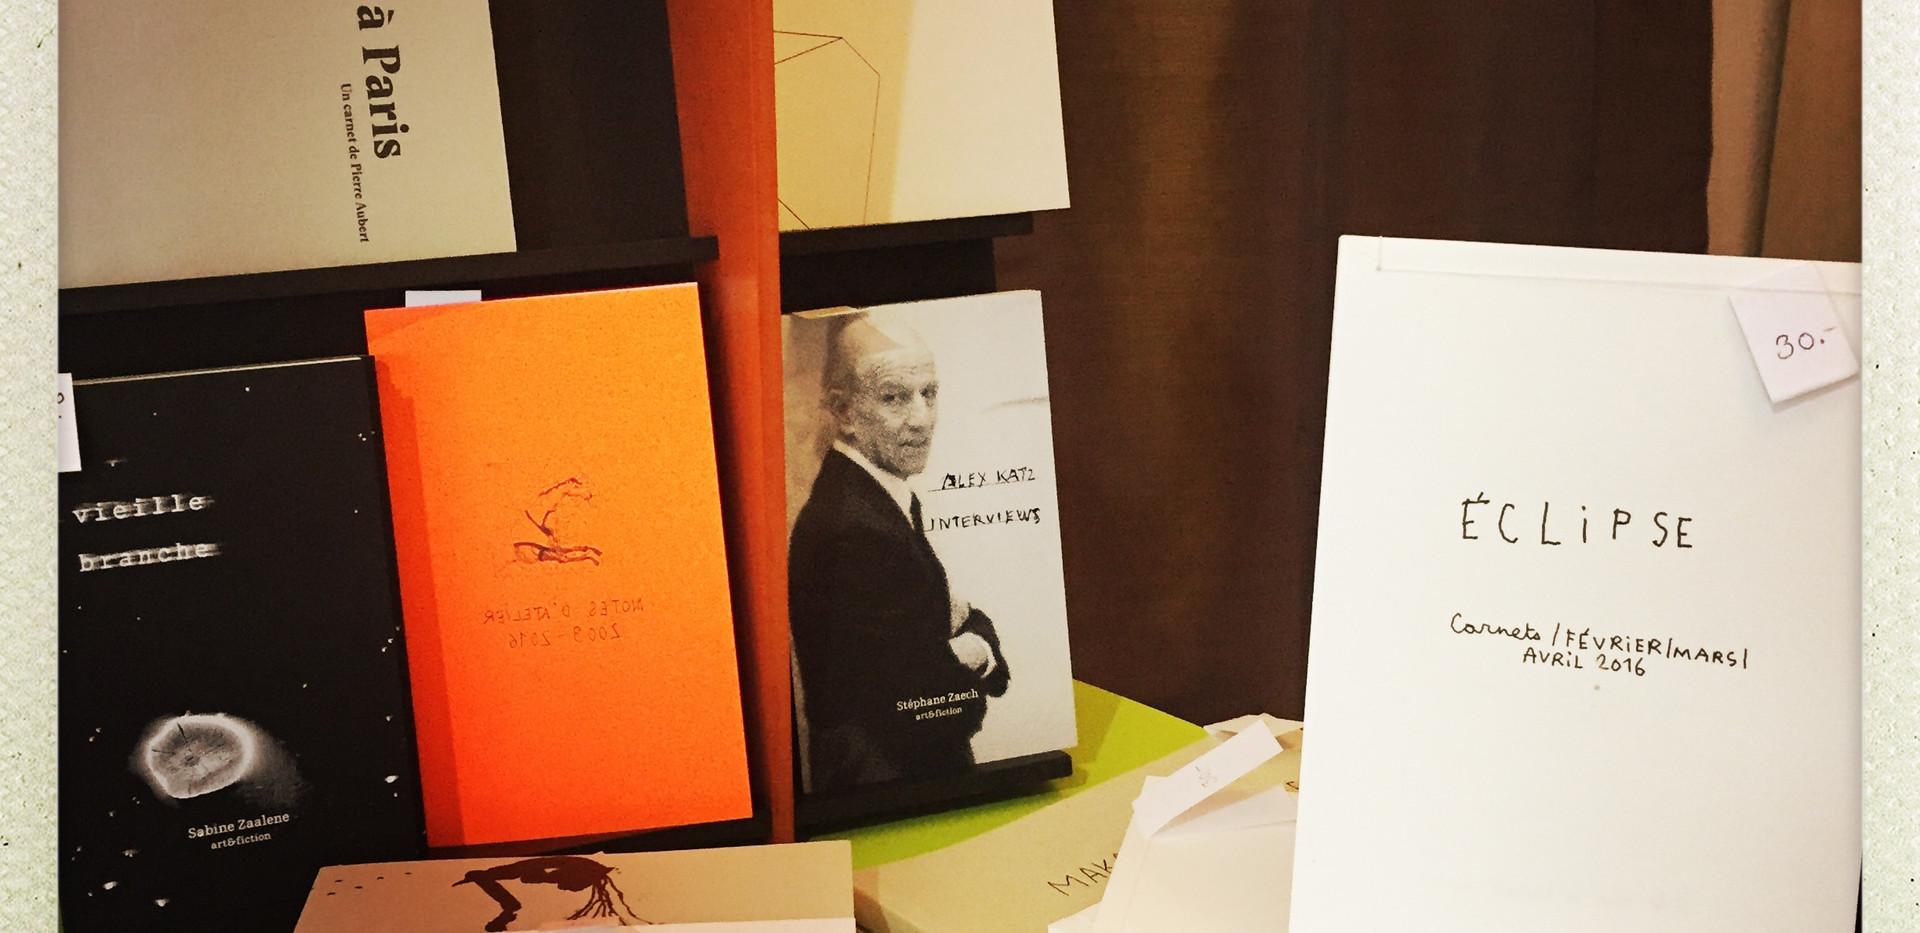 art&fiction editions